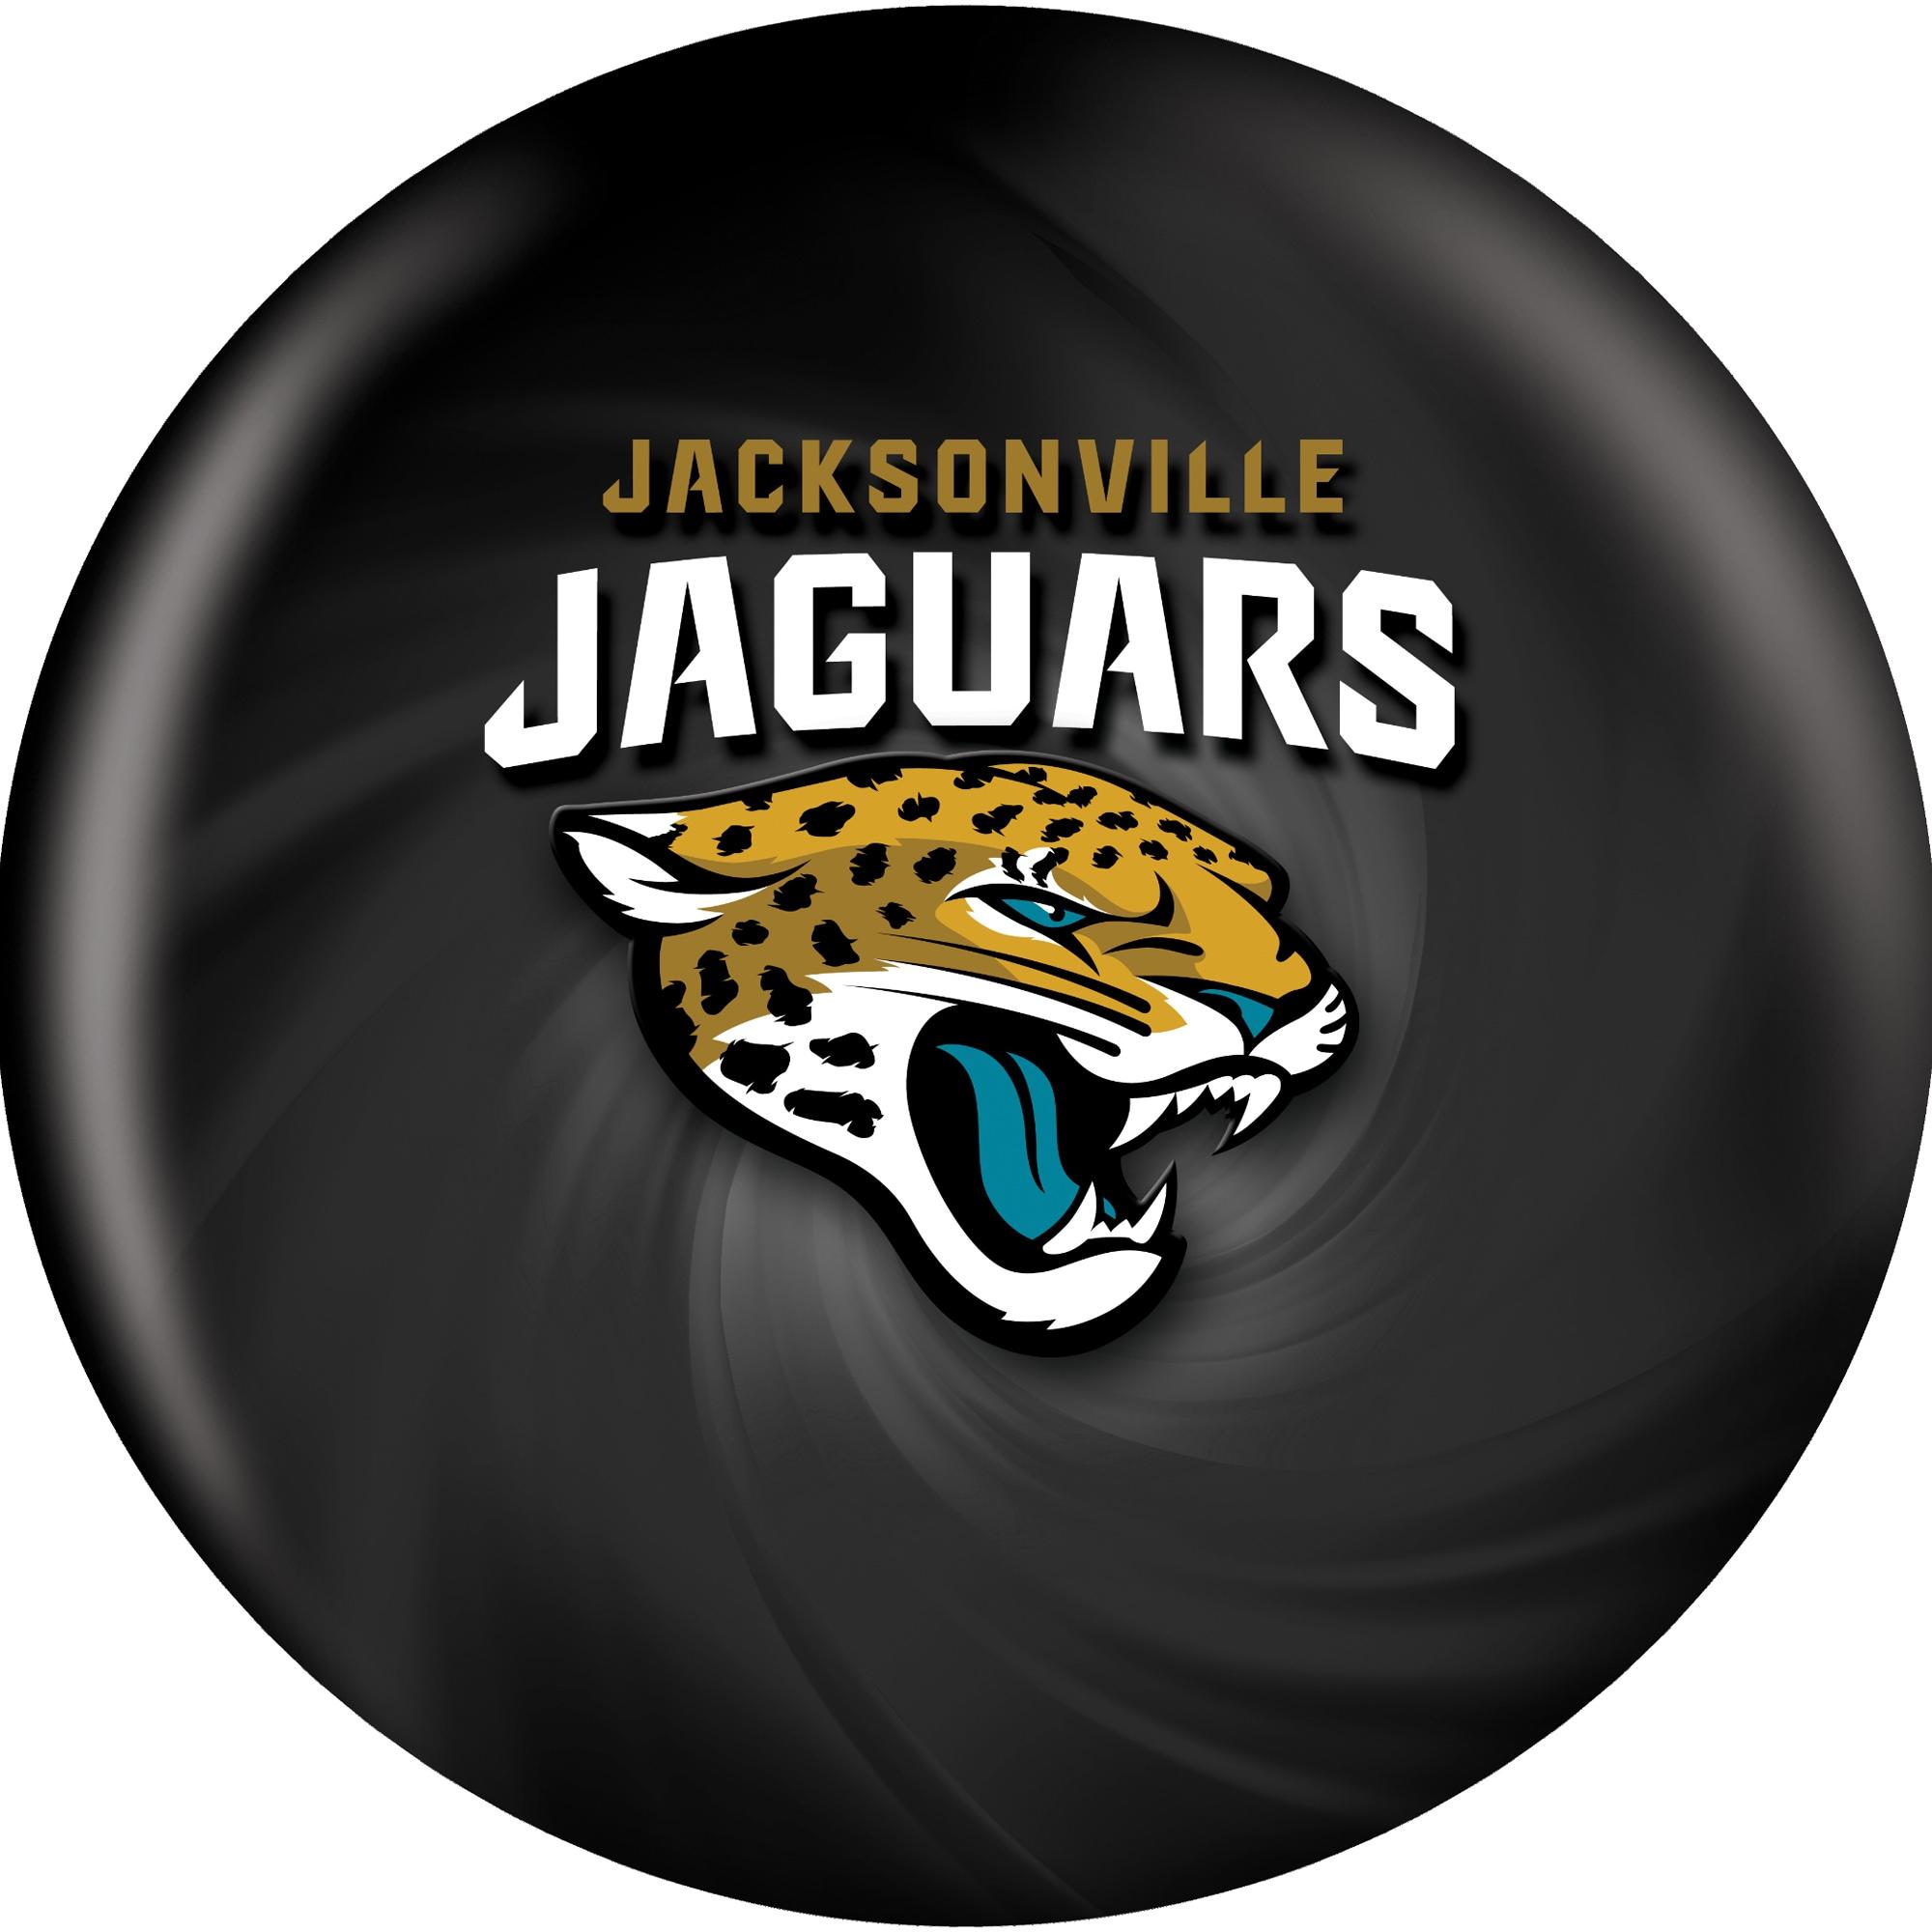 Jacksonville Jaguars Bowling Ball